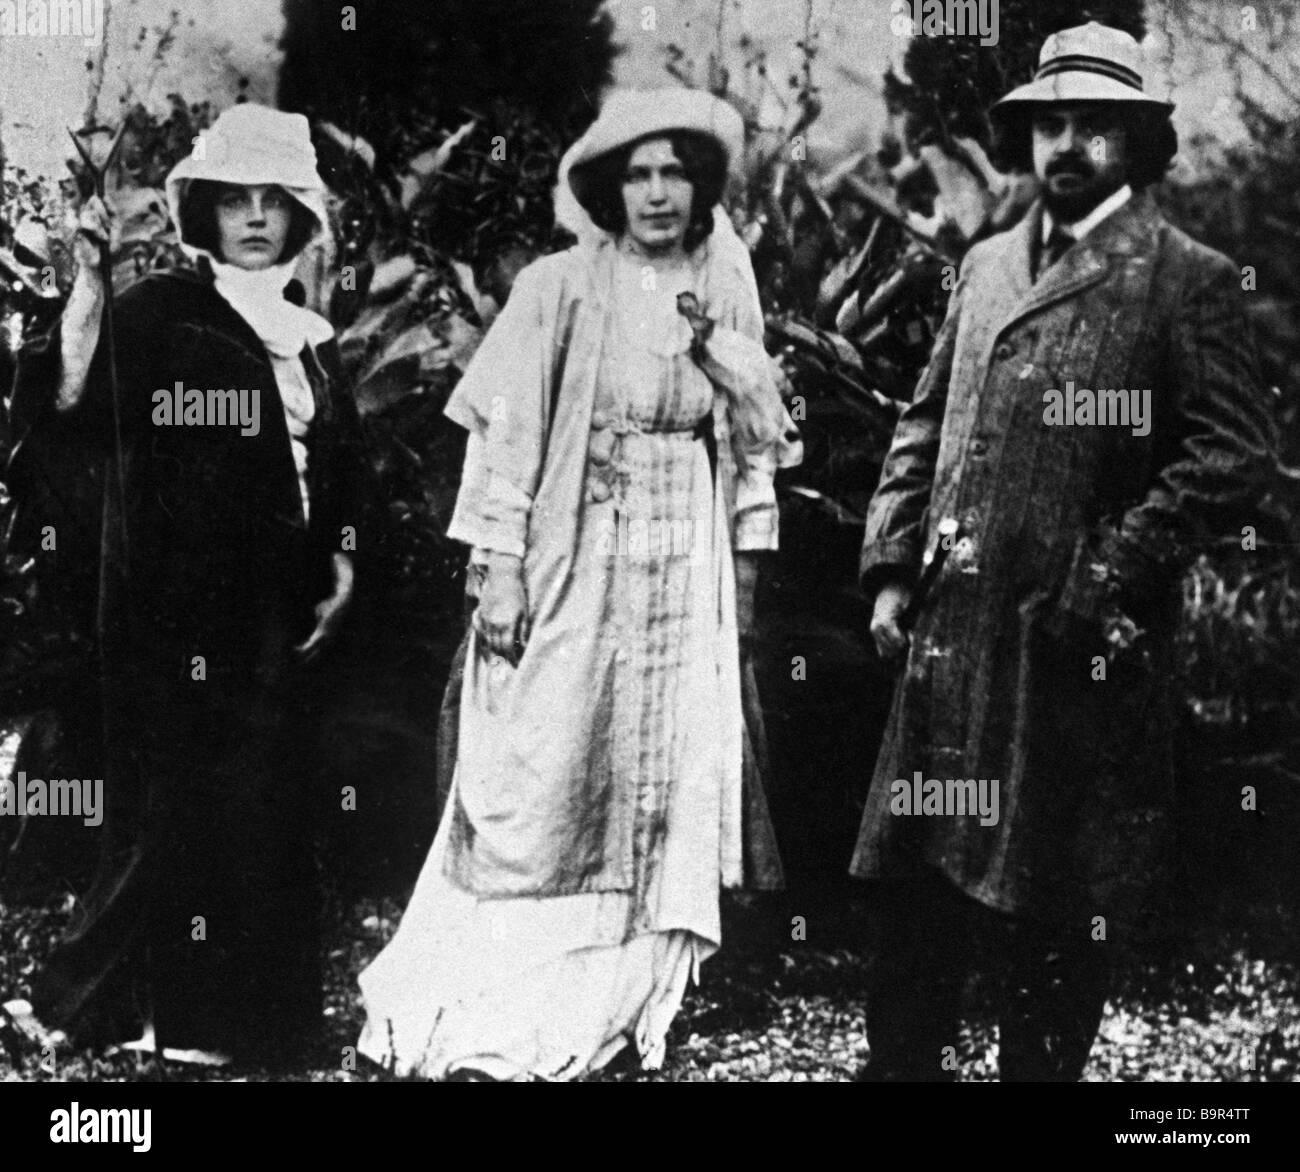 Russian bourgeois mystic philosopher Nikolai Berdyaev right his wife left and Adelaida Gertsyk Zhukovskaya center - Stock Image